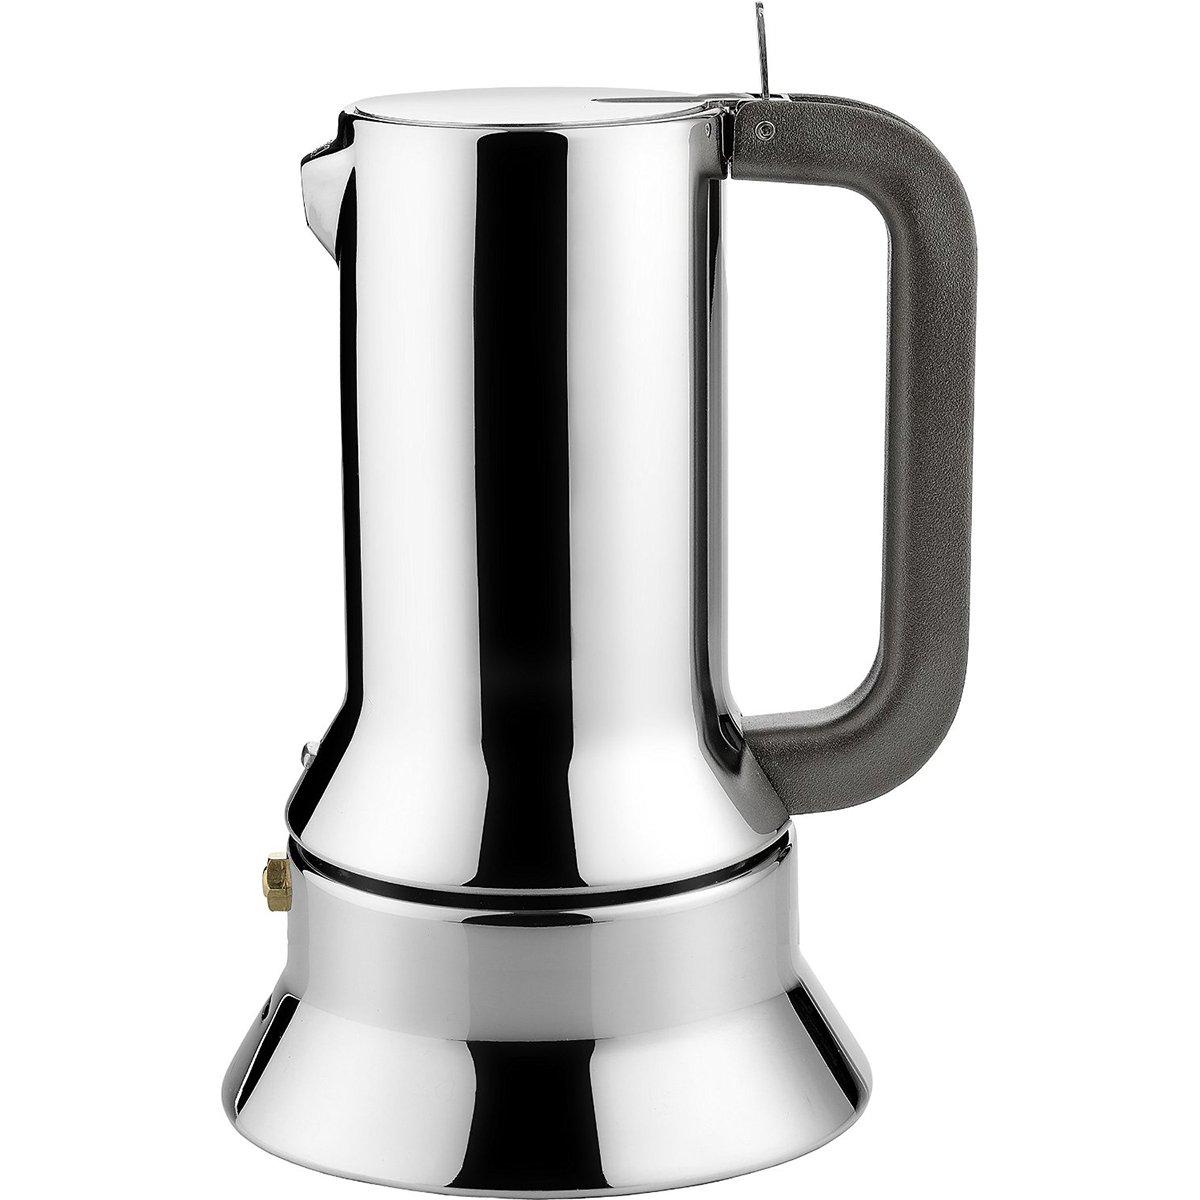 Alessi Espresso Maker 9090 by Richard Sapper, 6 Espresso Cups by Alessi